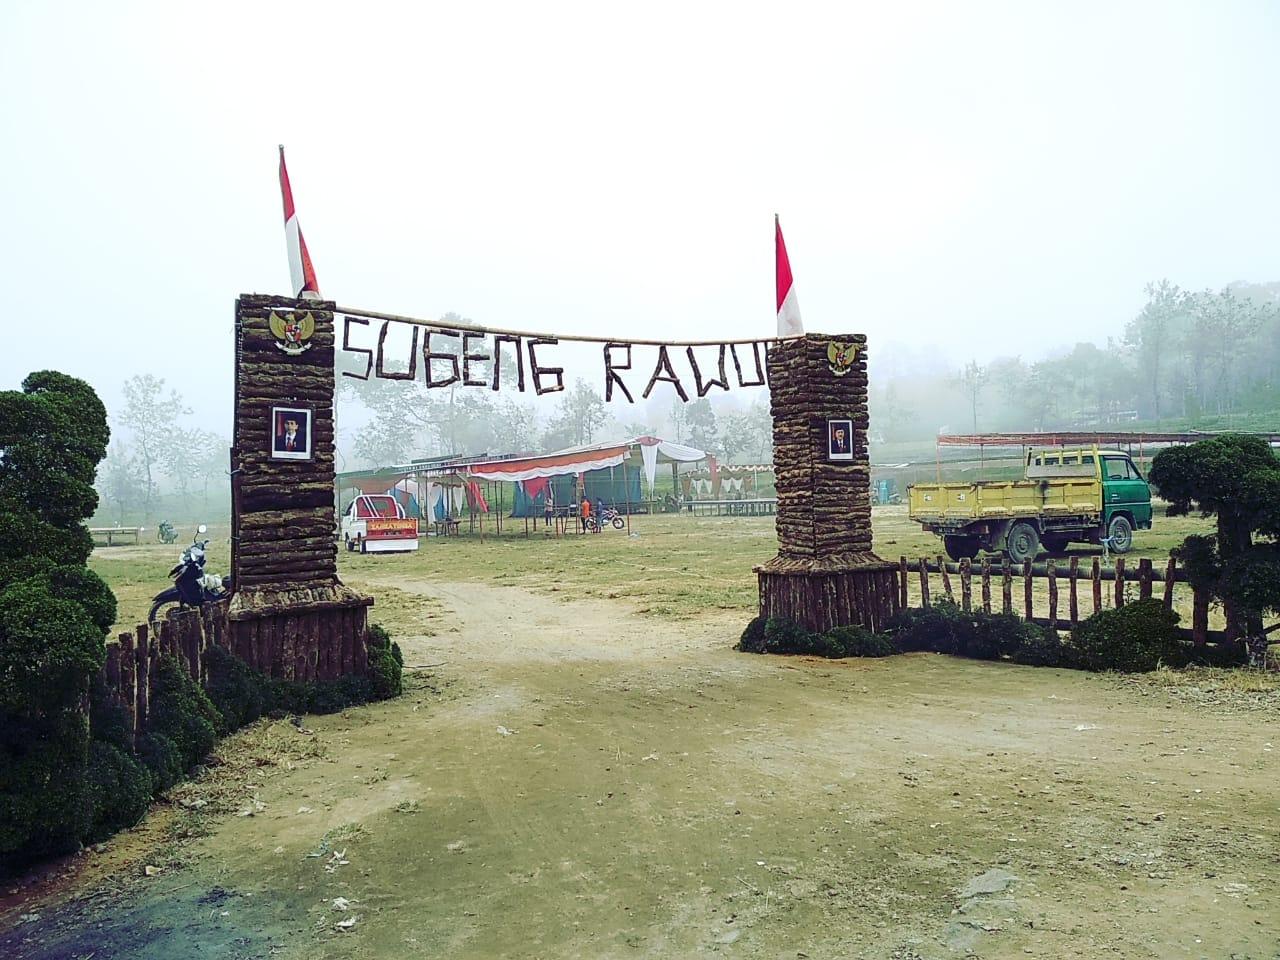 Masyarakat Candiyasan Persiapkan Tempat Jelang Rangkaian Gelar Budaya